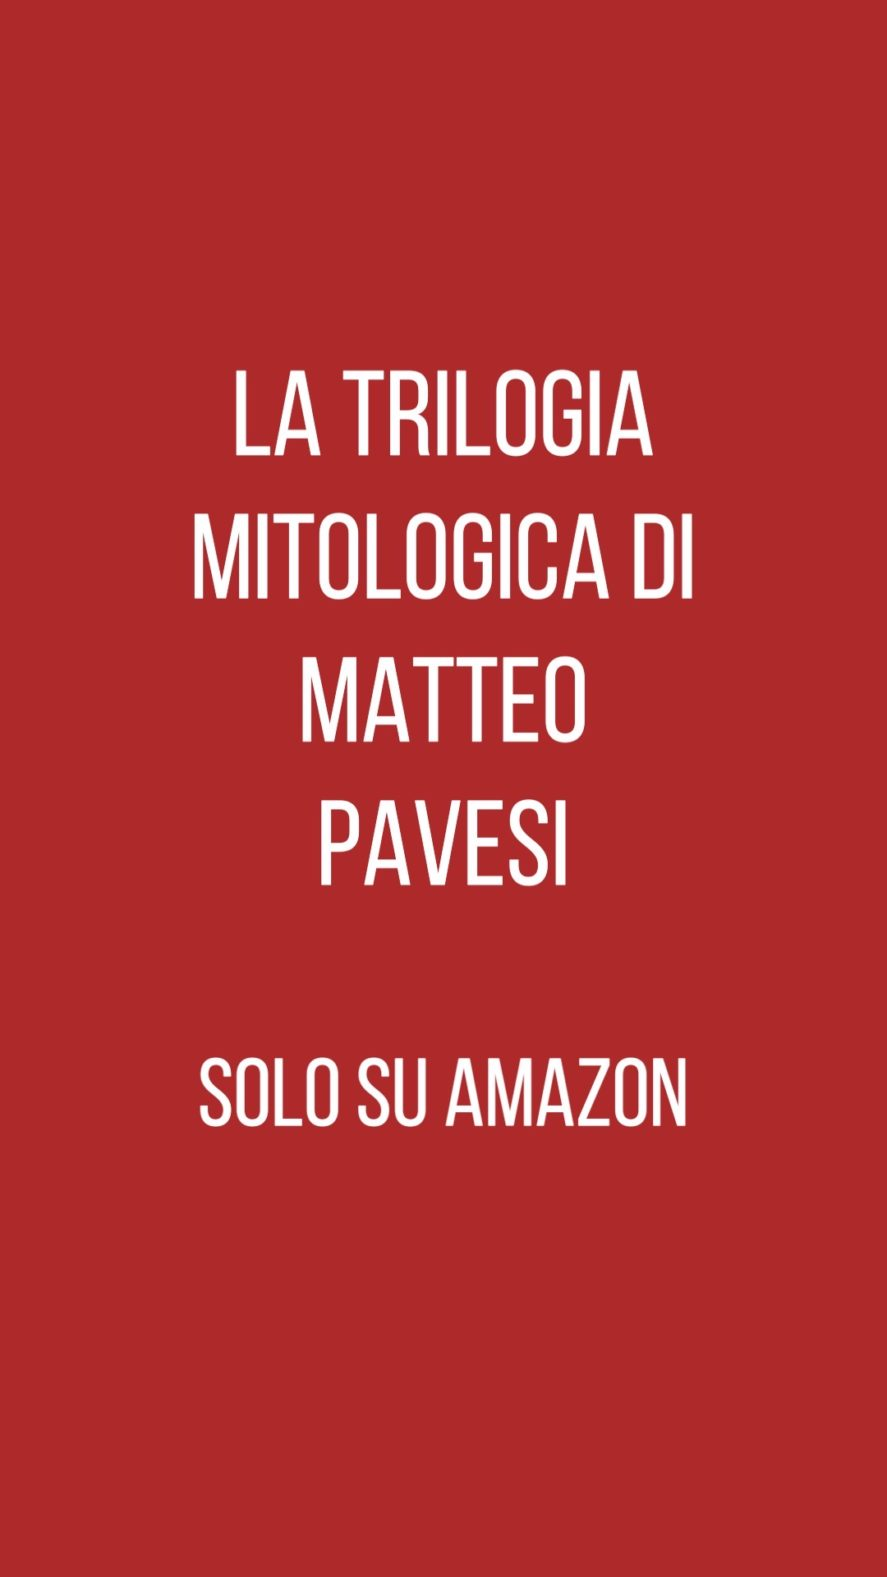 trilogia mitologica Matteo Pavesi